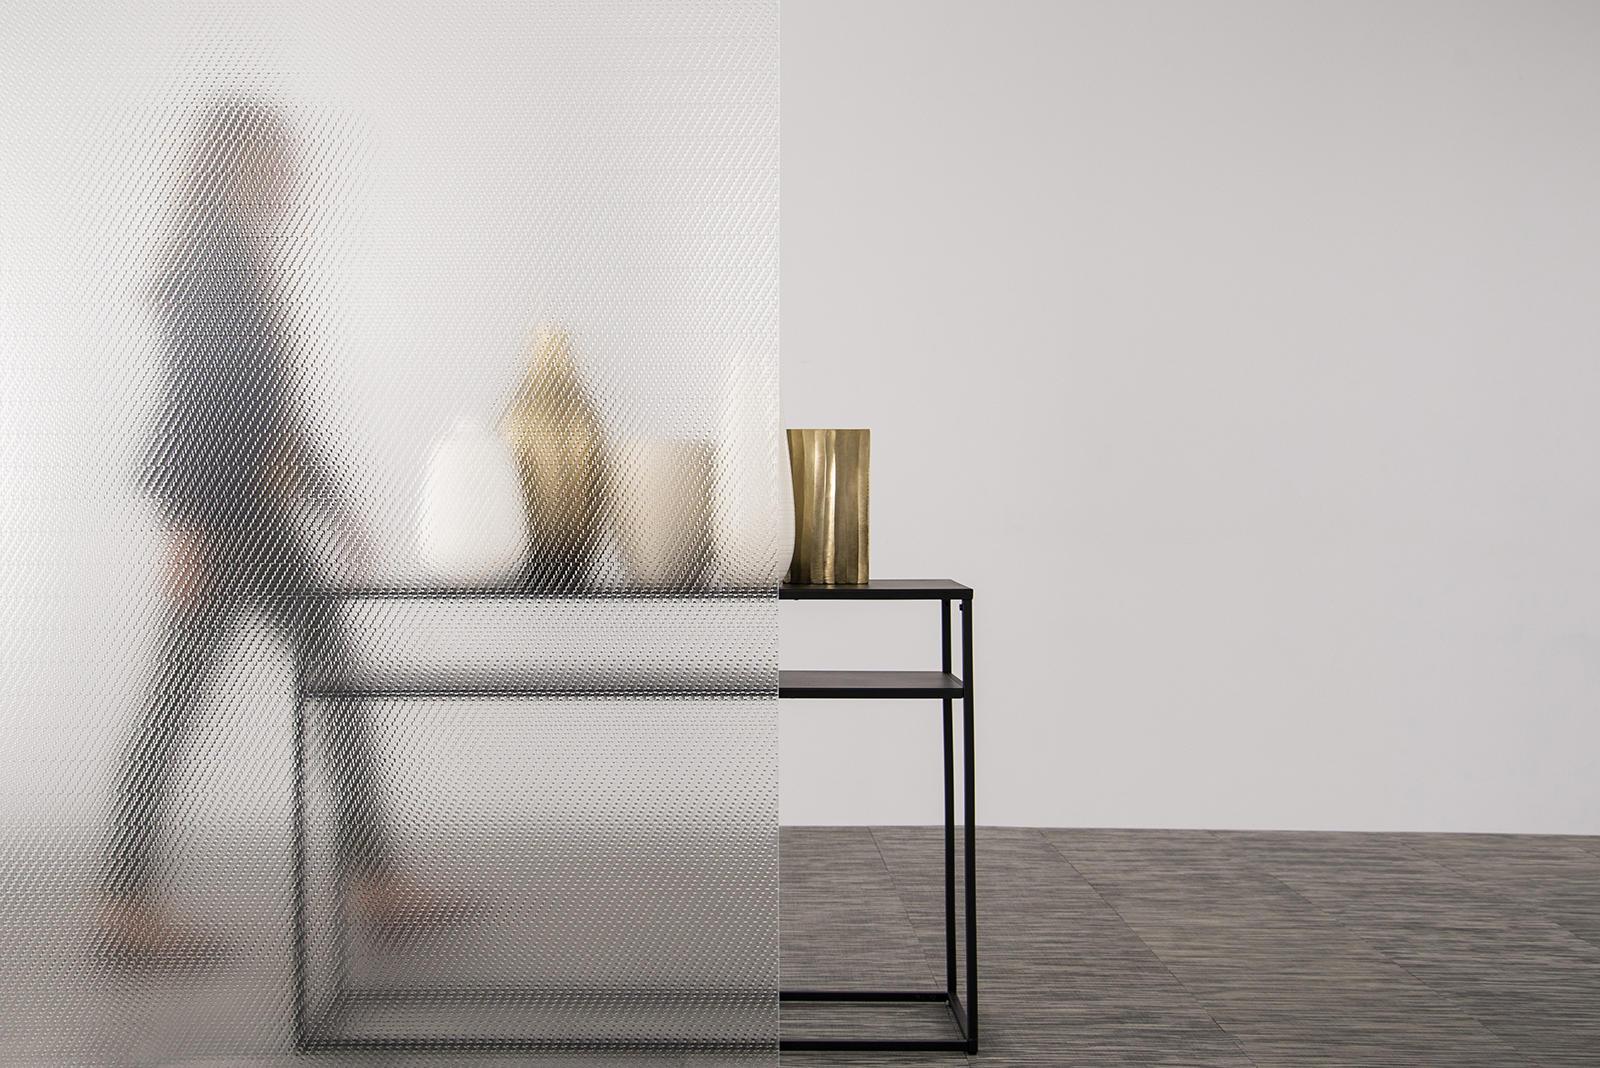 BermanGlass Intervals Kiln Cast Glass in Origin texture